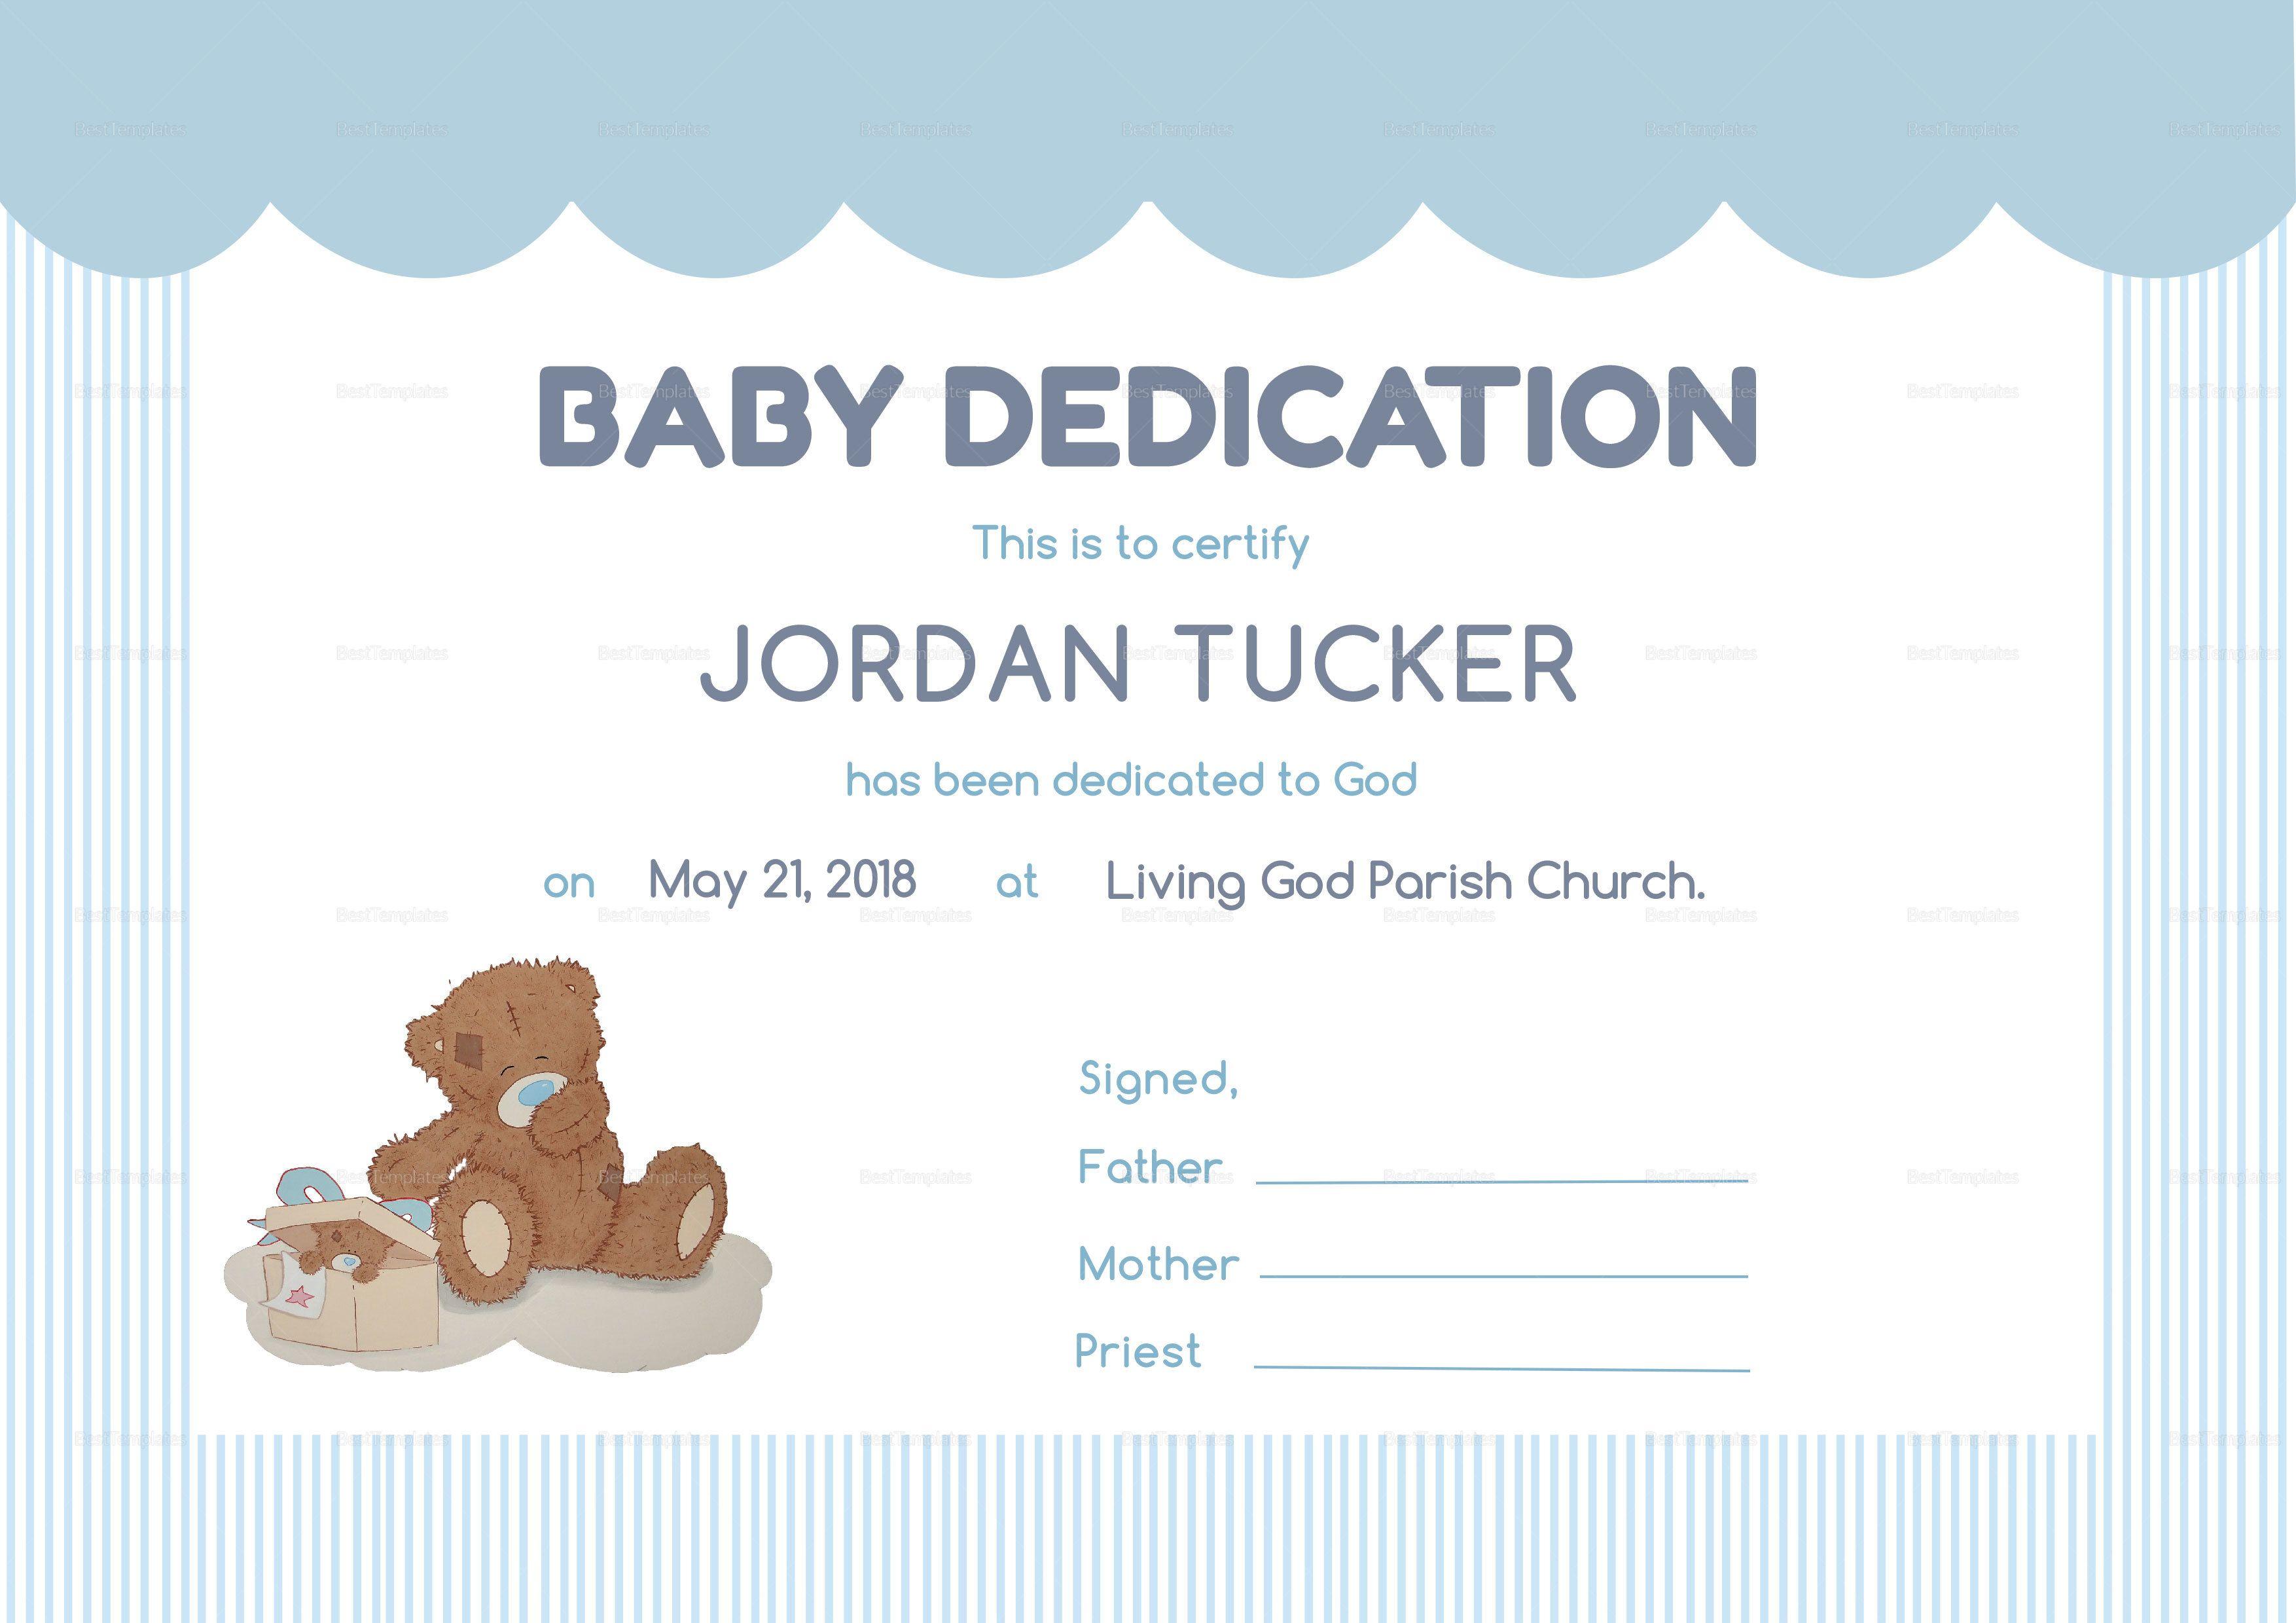 Baby Dedication Certificate Template Birth Certificate Template Certificate Templates Baby Dedication Certificate Baby dedication certificate template printable